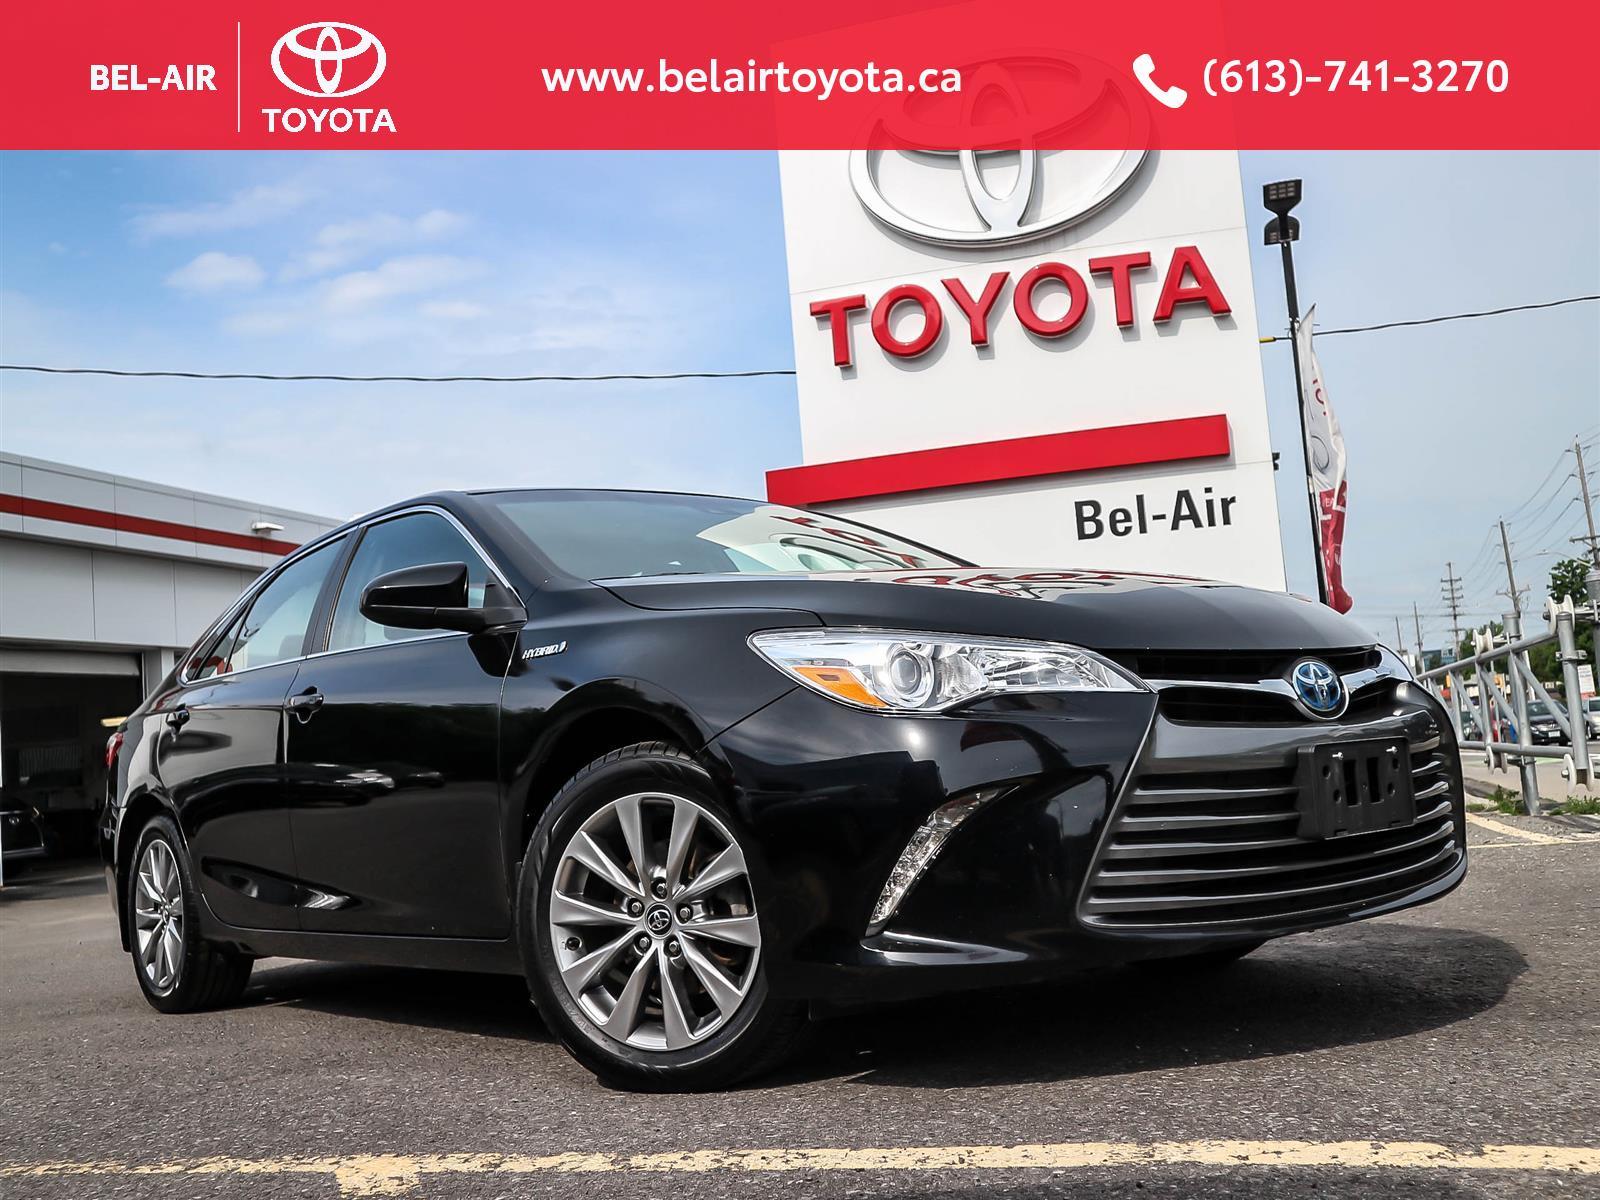 2017 Toyota Camry XLE/HYBRID-0